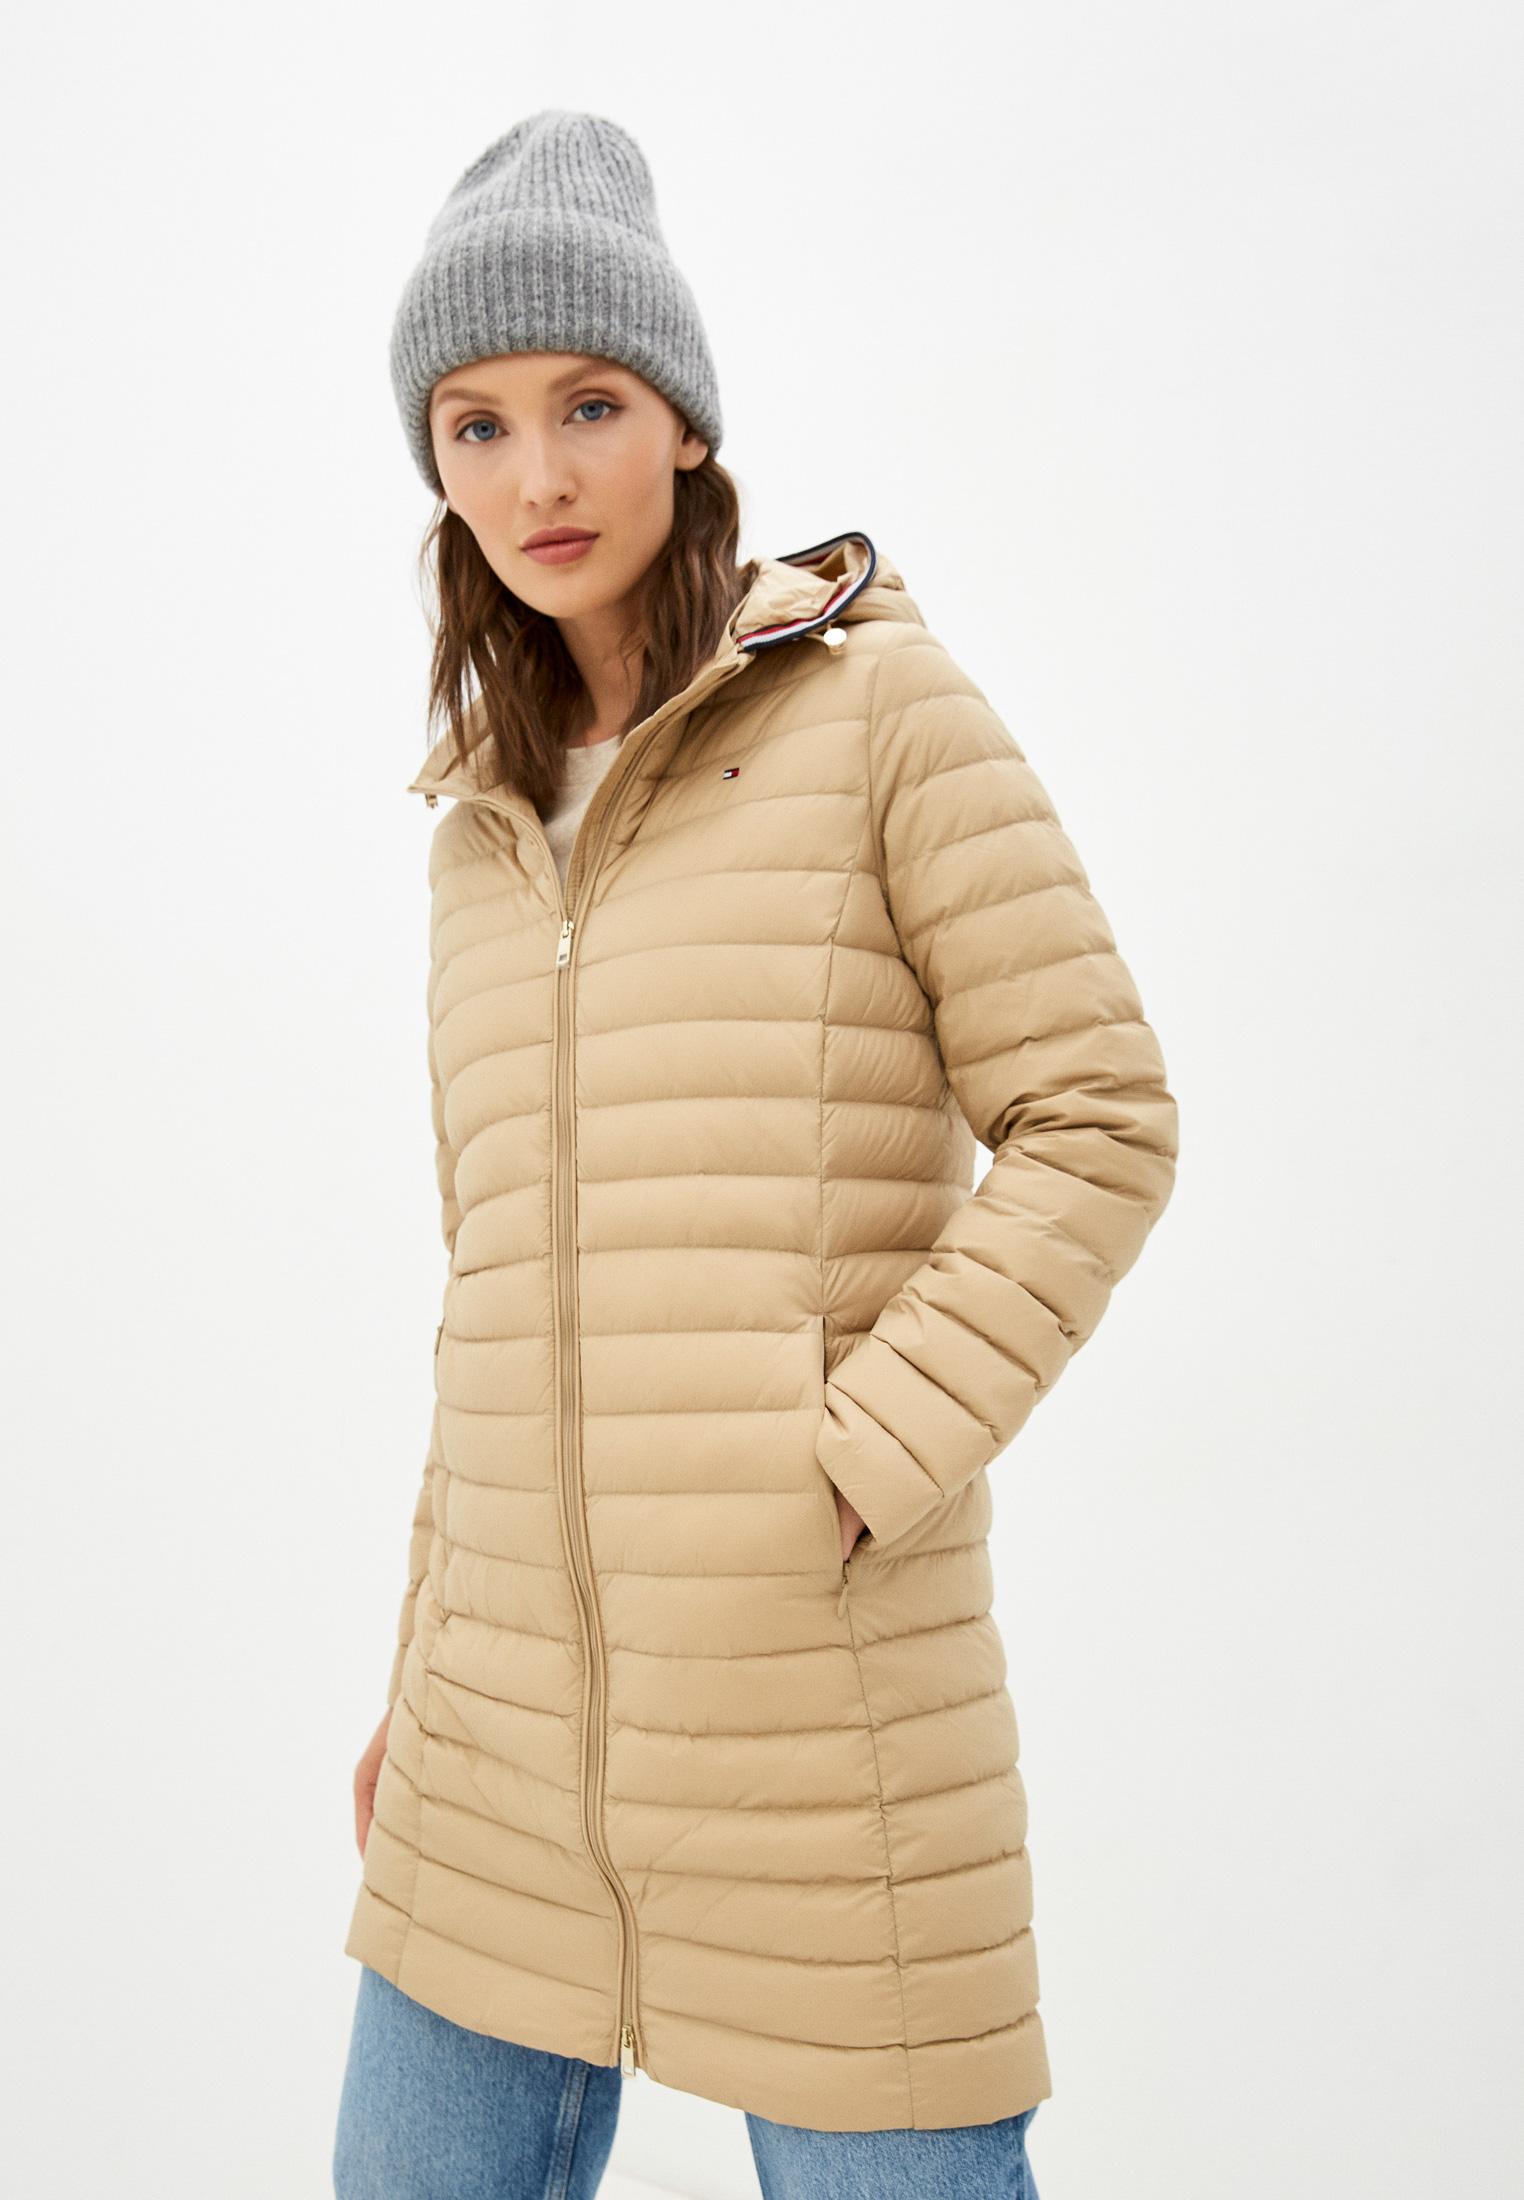 Утепленная куртка Tommy Hilfiger (Томми Хилфигер) WW0WW31035